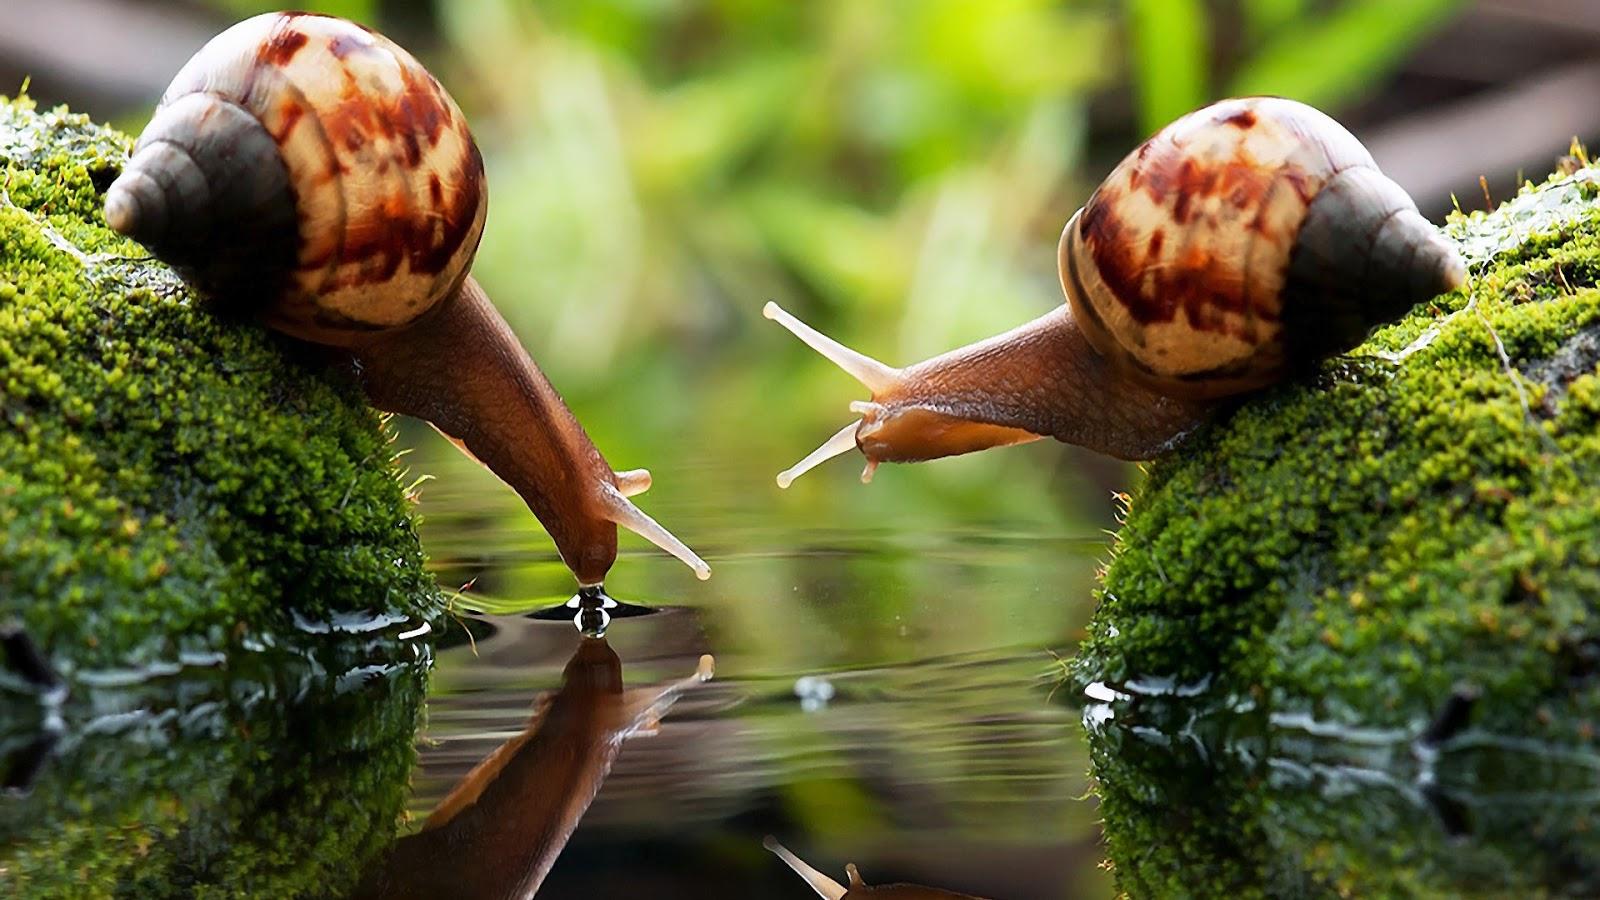 Banco de im genes 12 fotograf as de la naturaleza for Como criar caracoles de jardin